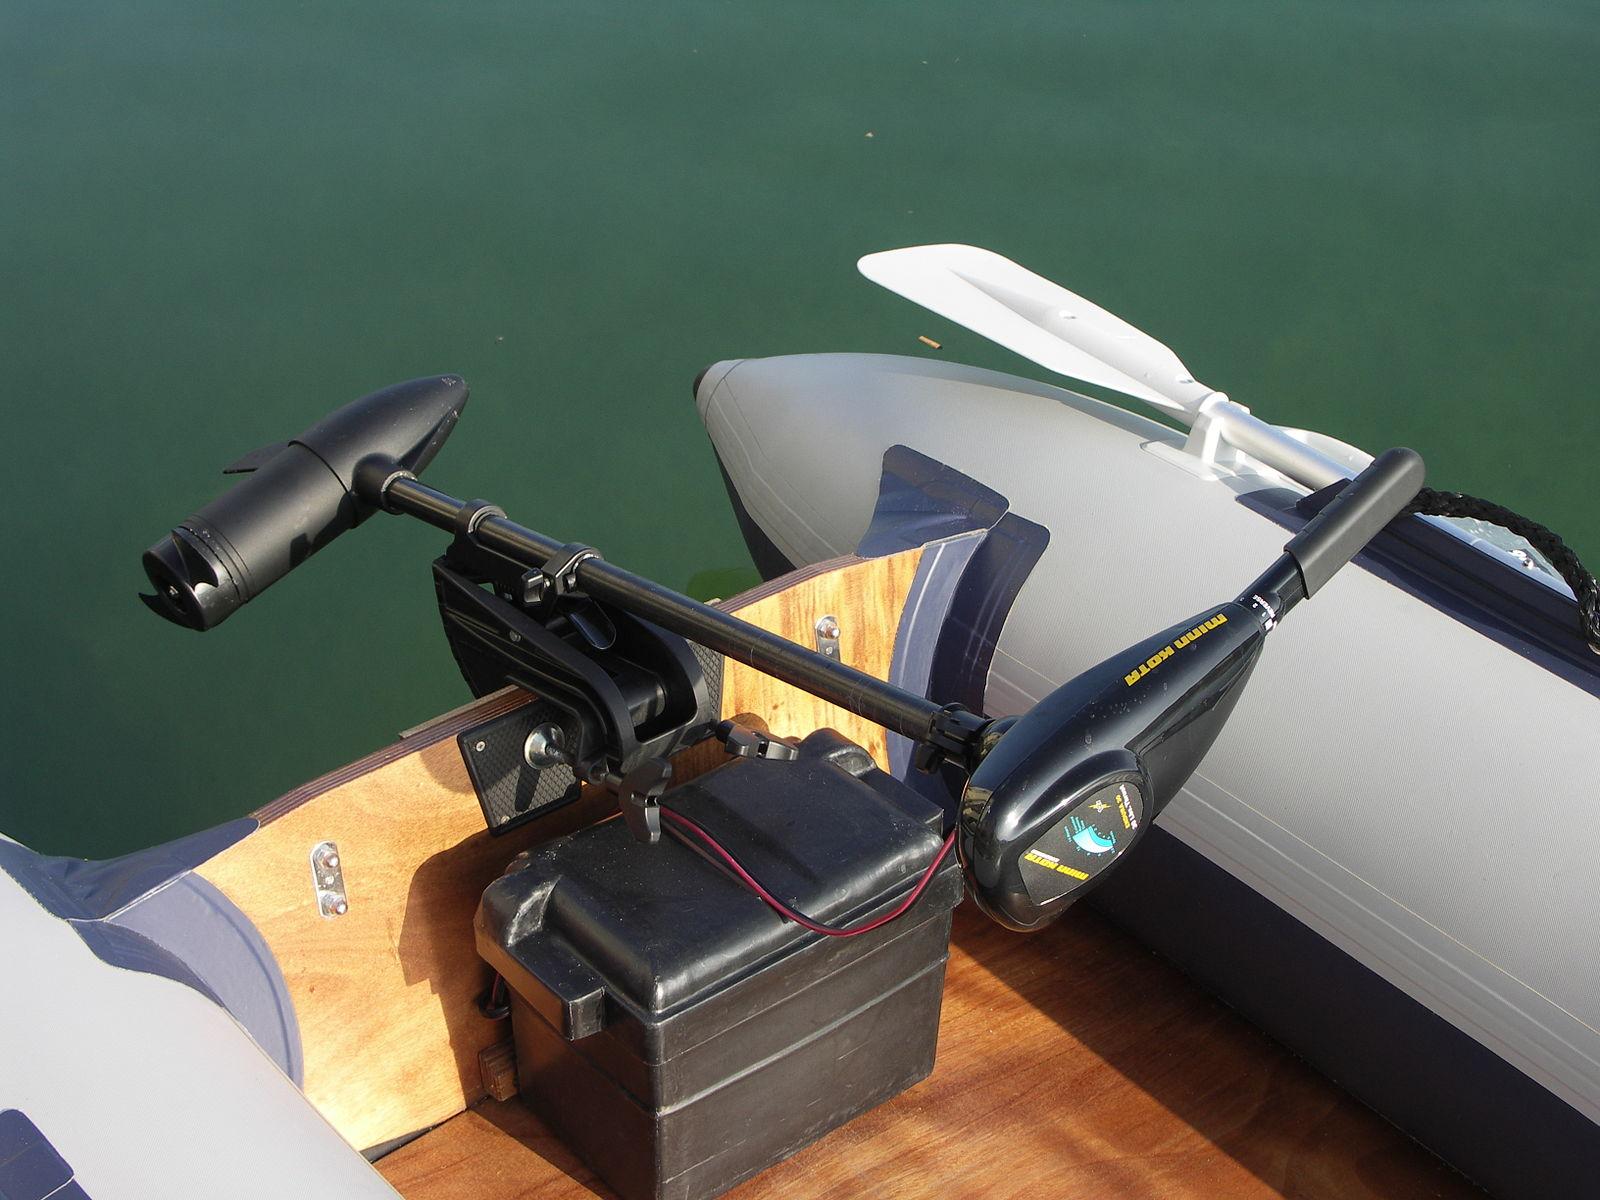 Minn Kota Outboard